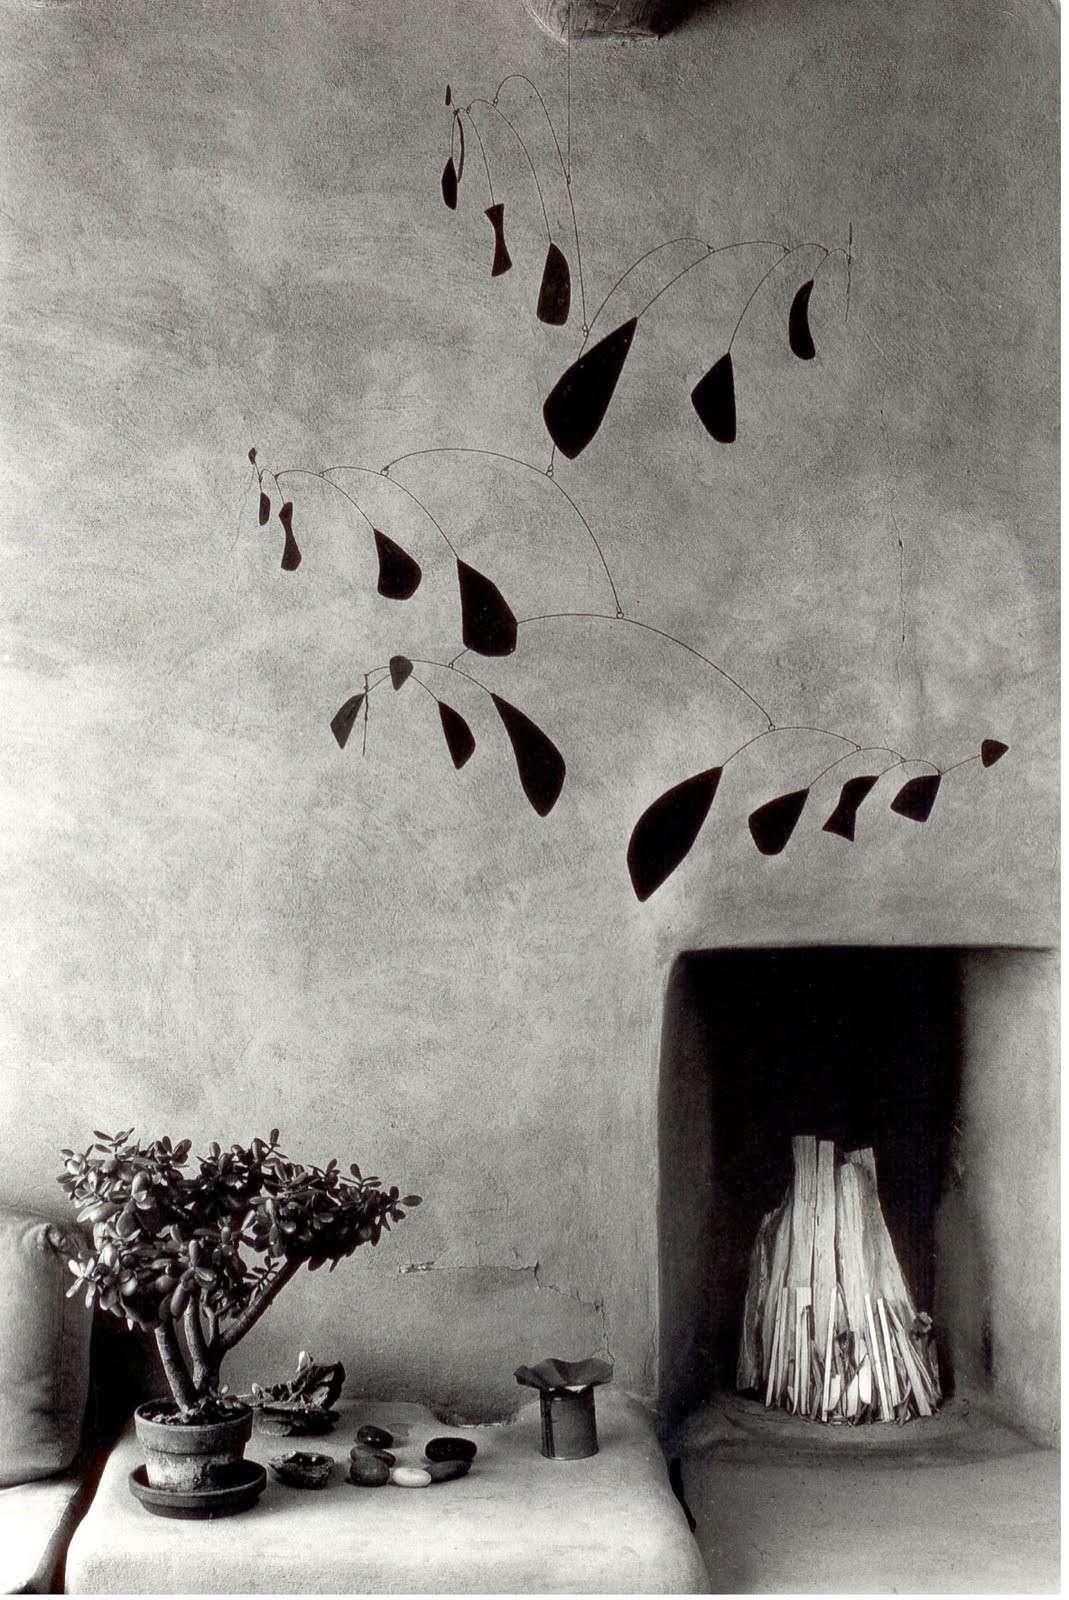 keeffe - Georgia O'Keeffe [peintre] - Page 3 Tumblr27